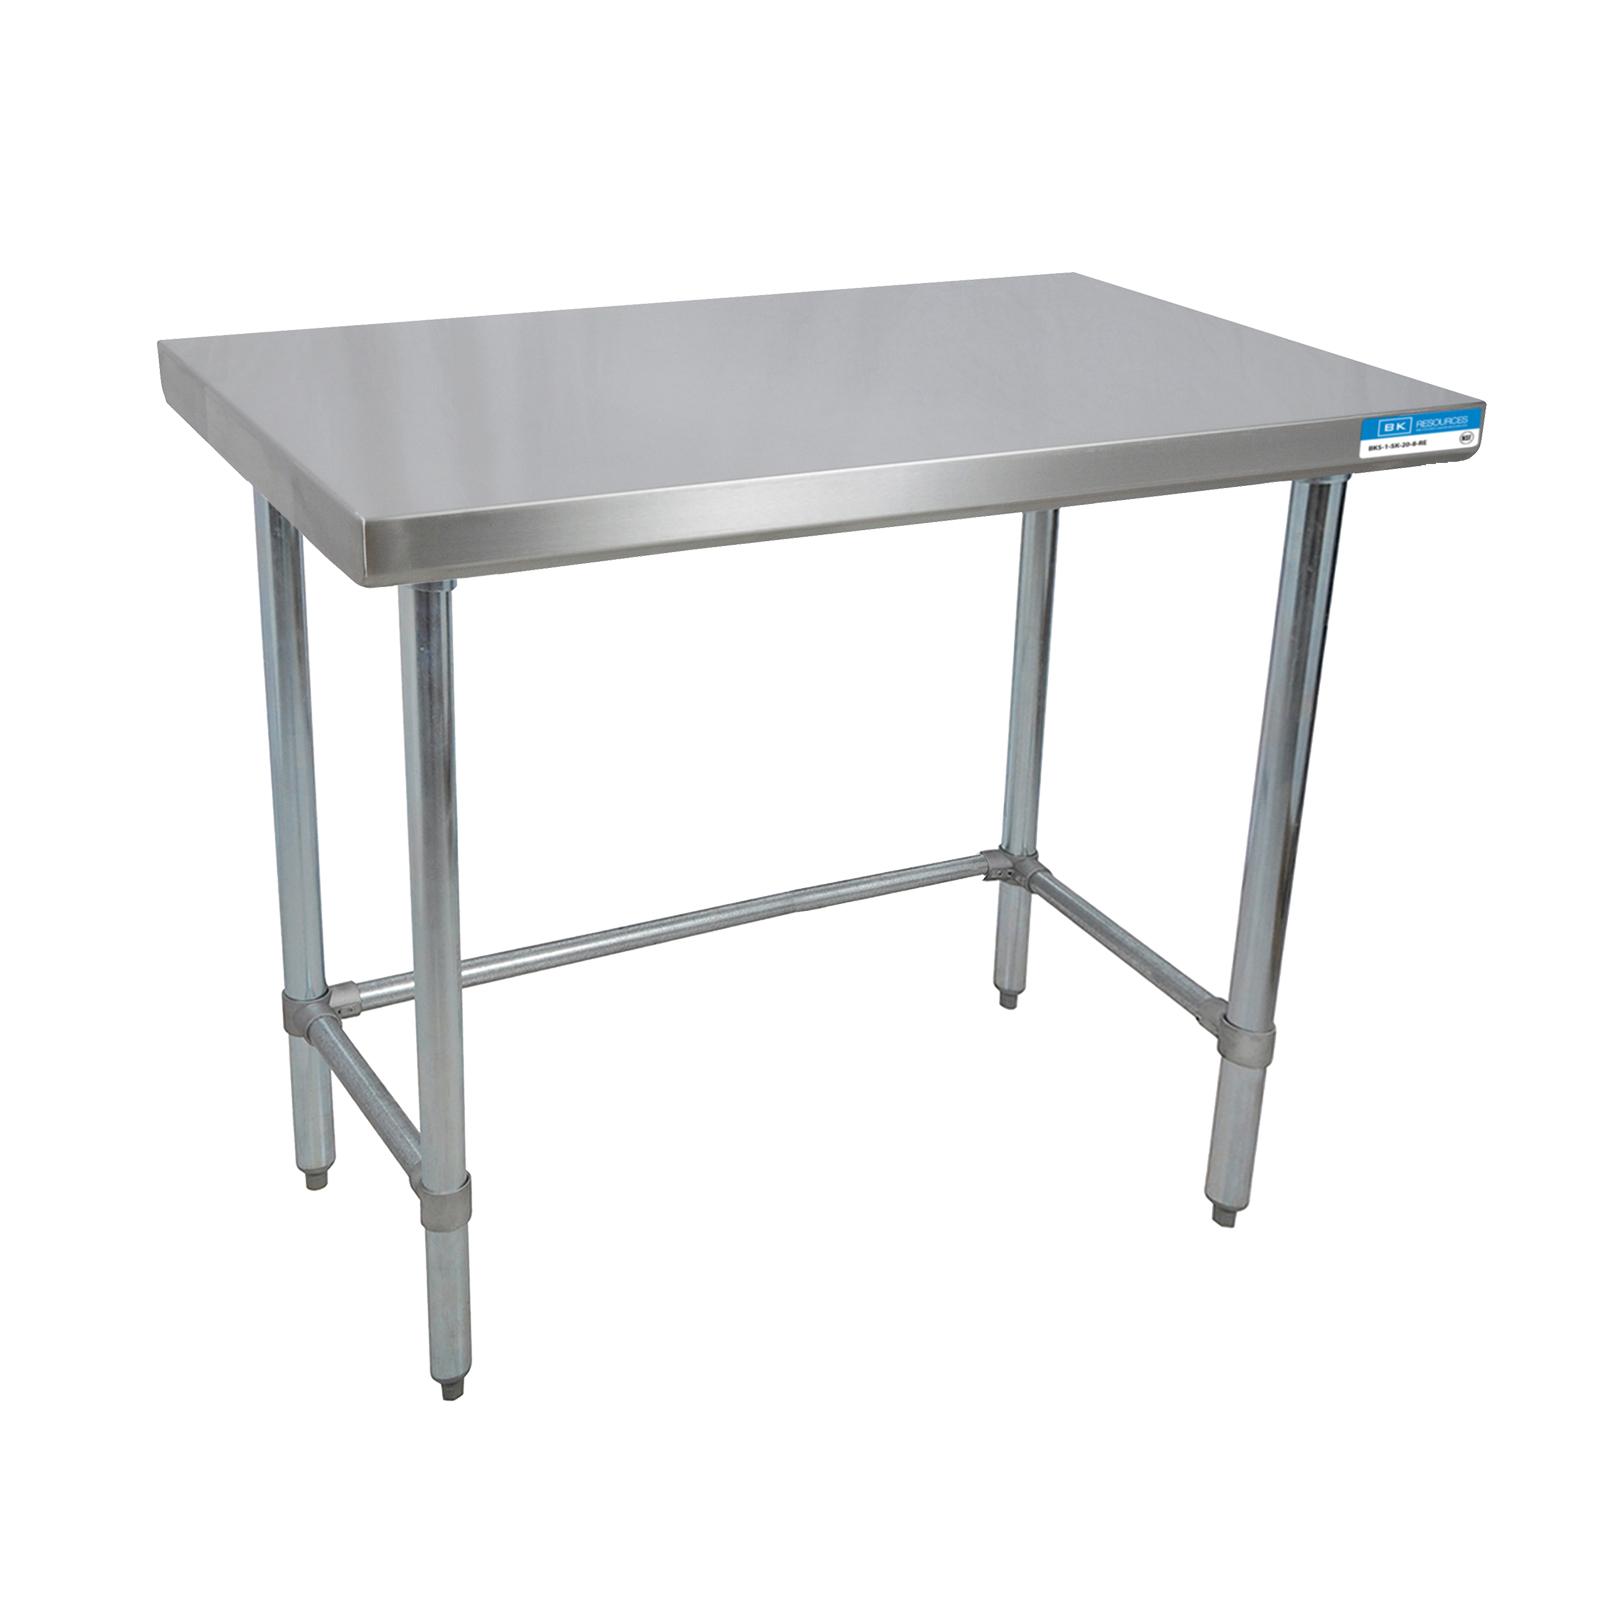 BK Resources SVTOB-4824 work table,  40